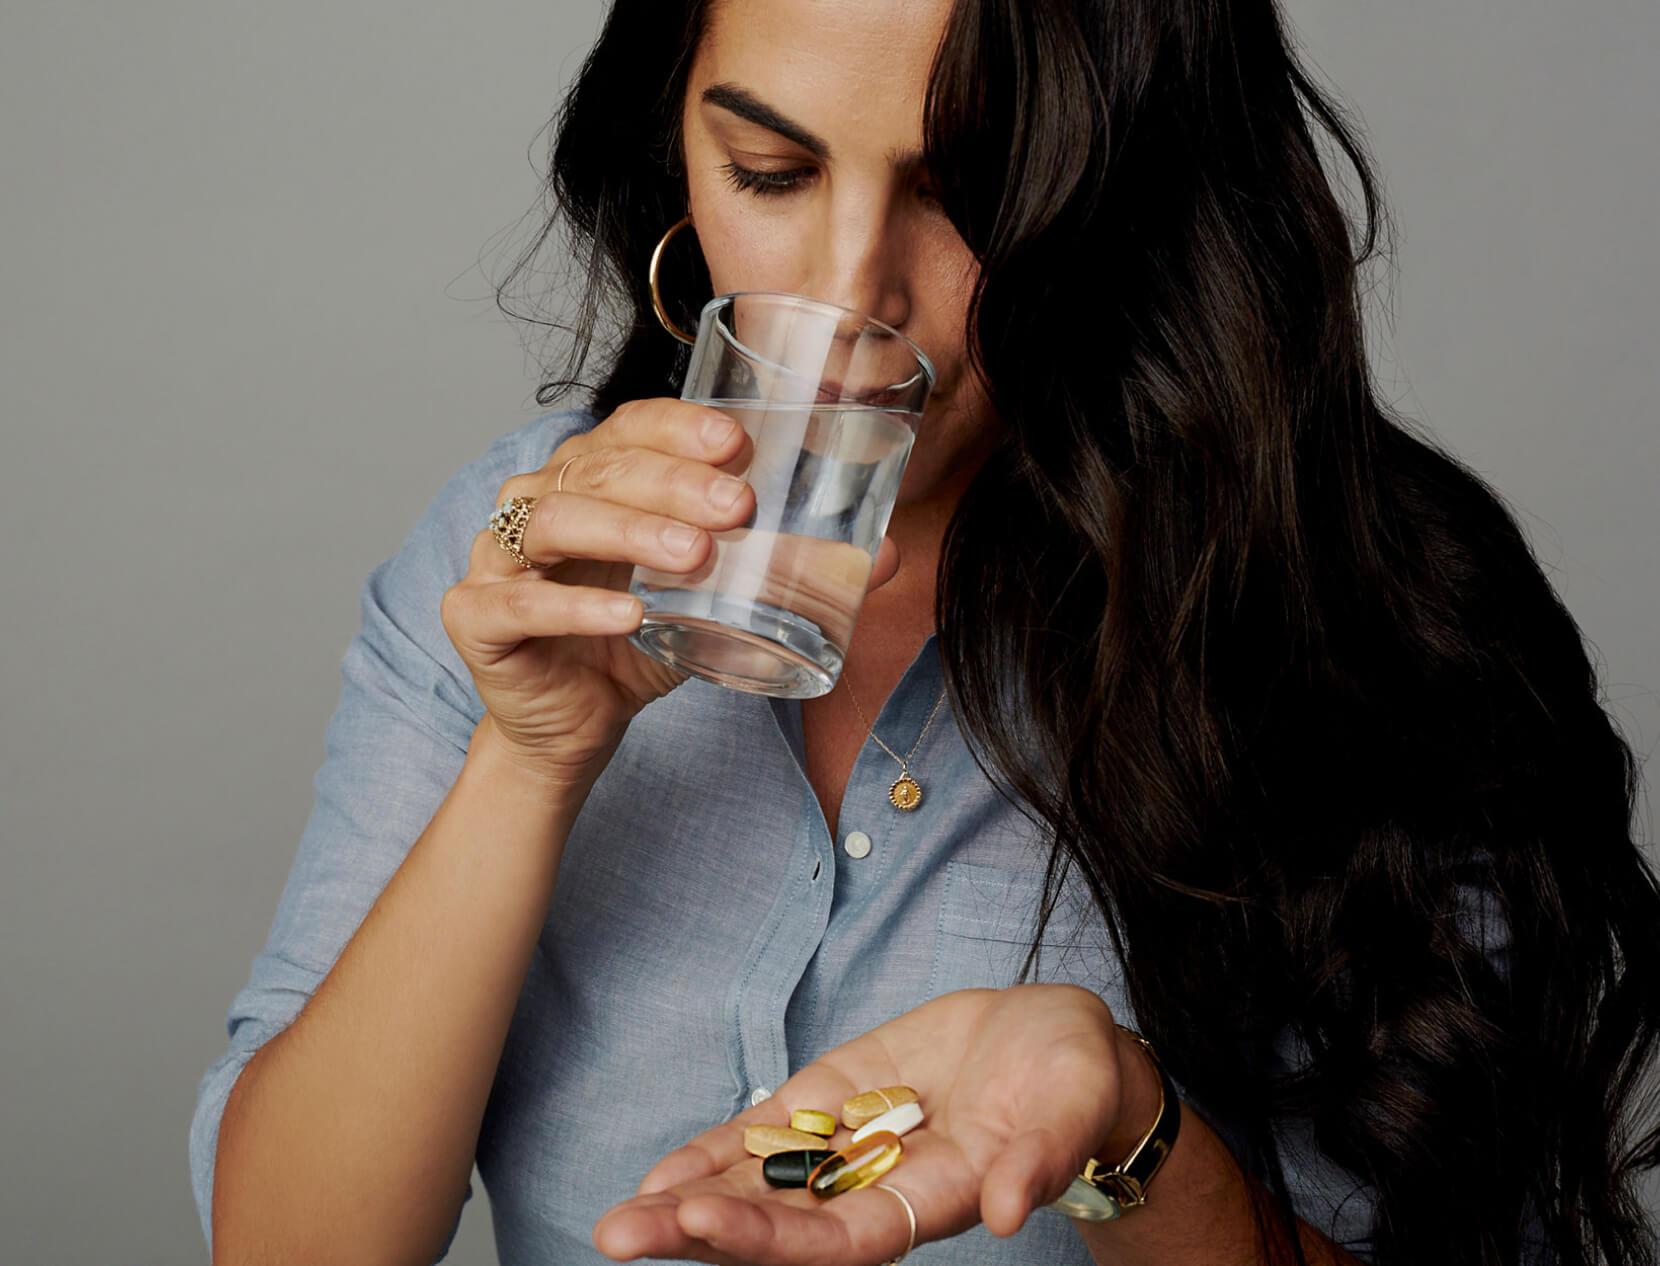 girl taking vitamins